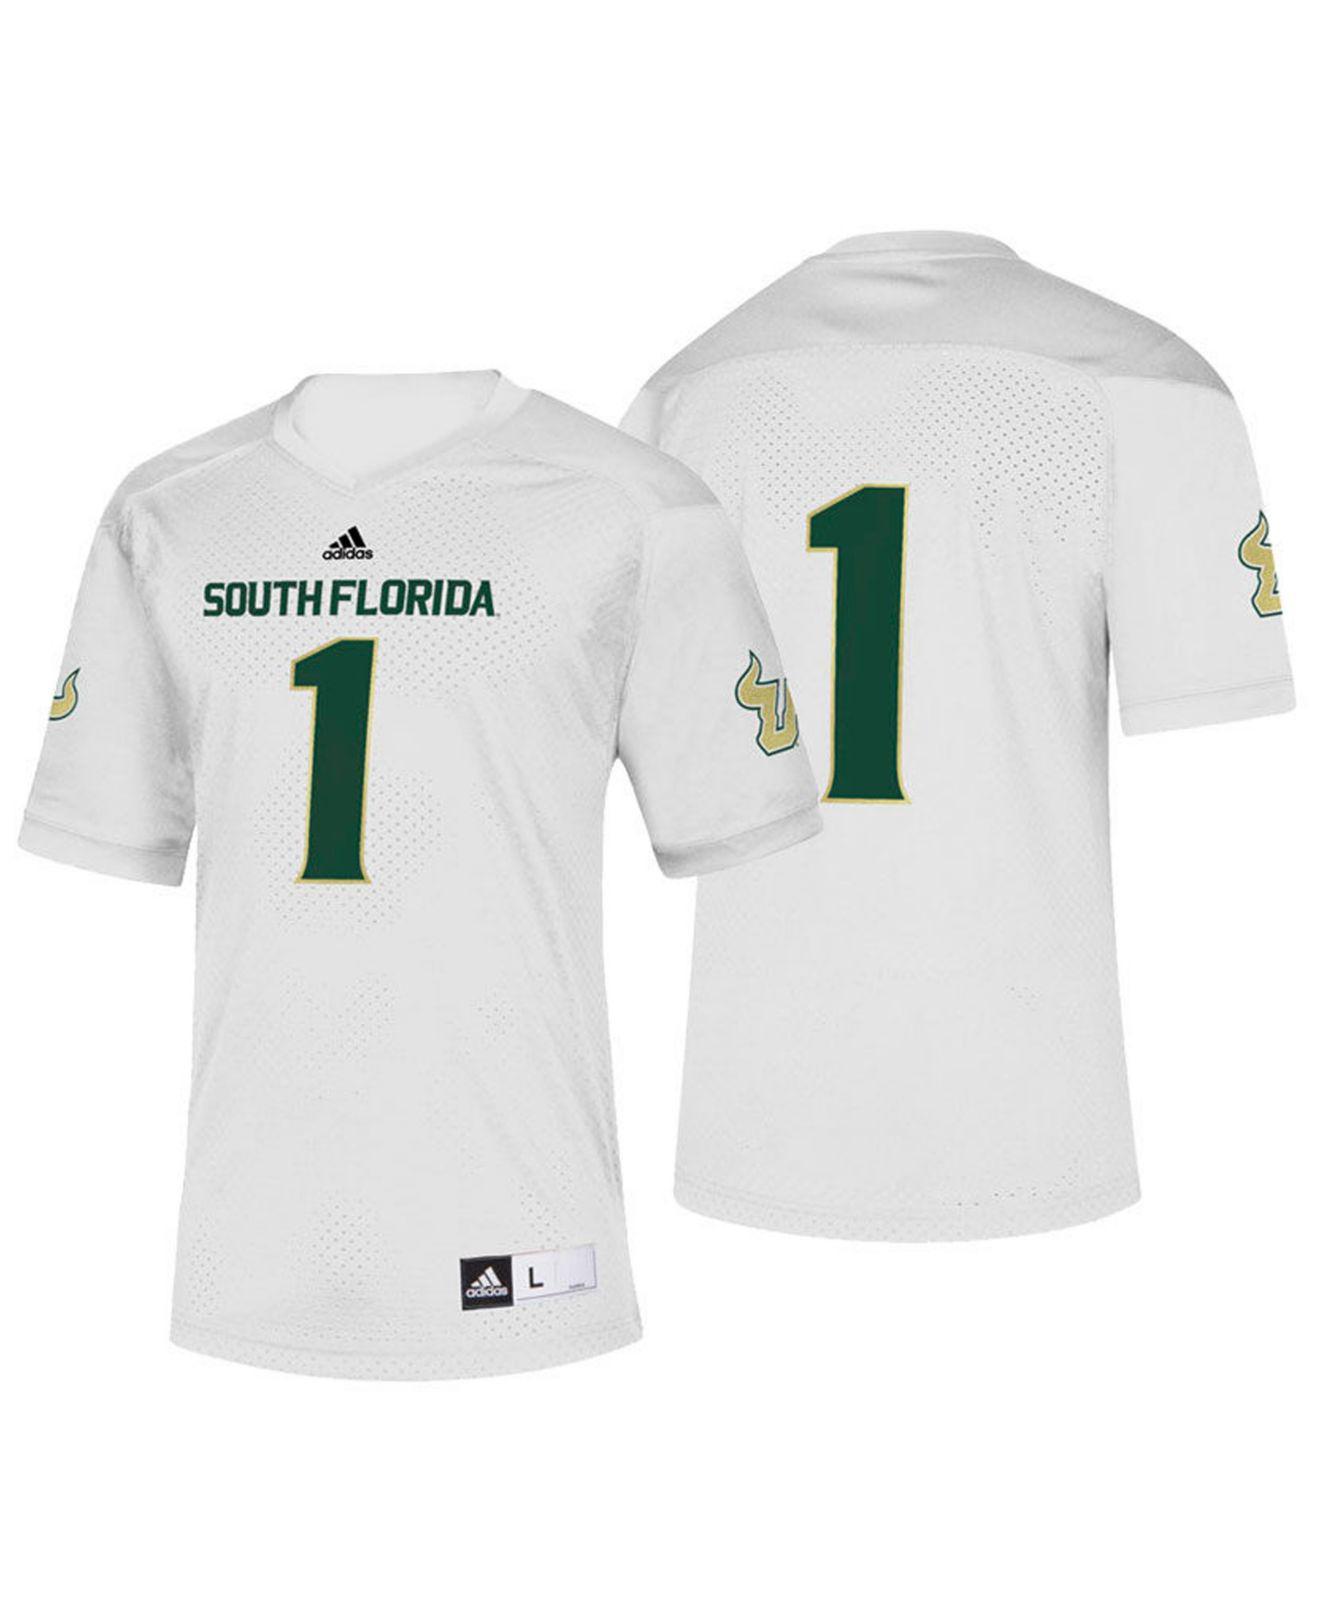 ... South Florida Bulls Replica Football Jersey for Men - Lyst. View  fullscreen 007ad8266